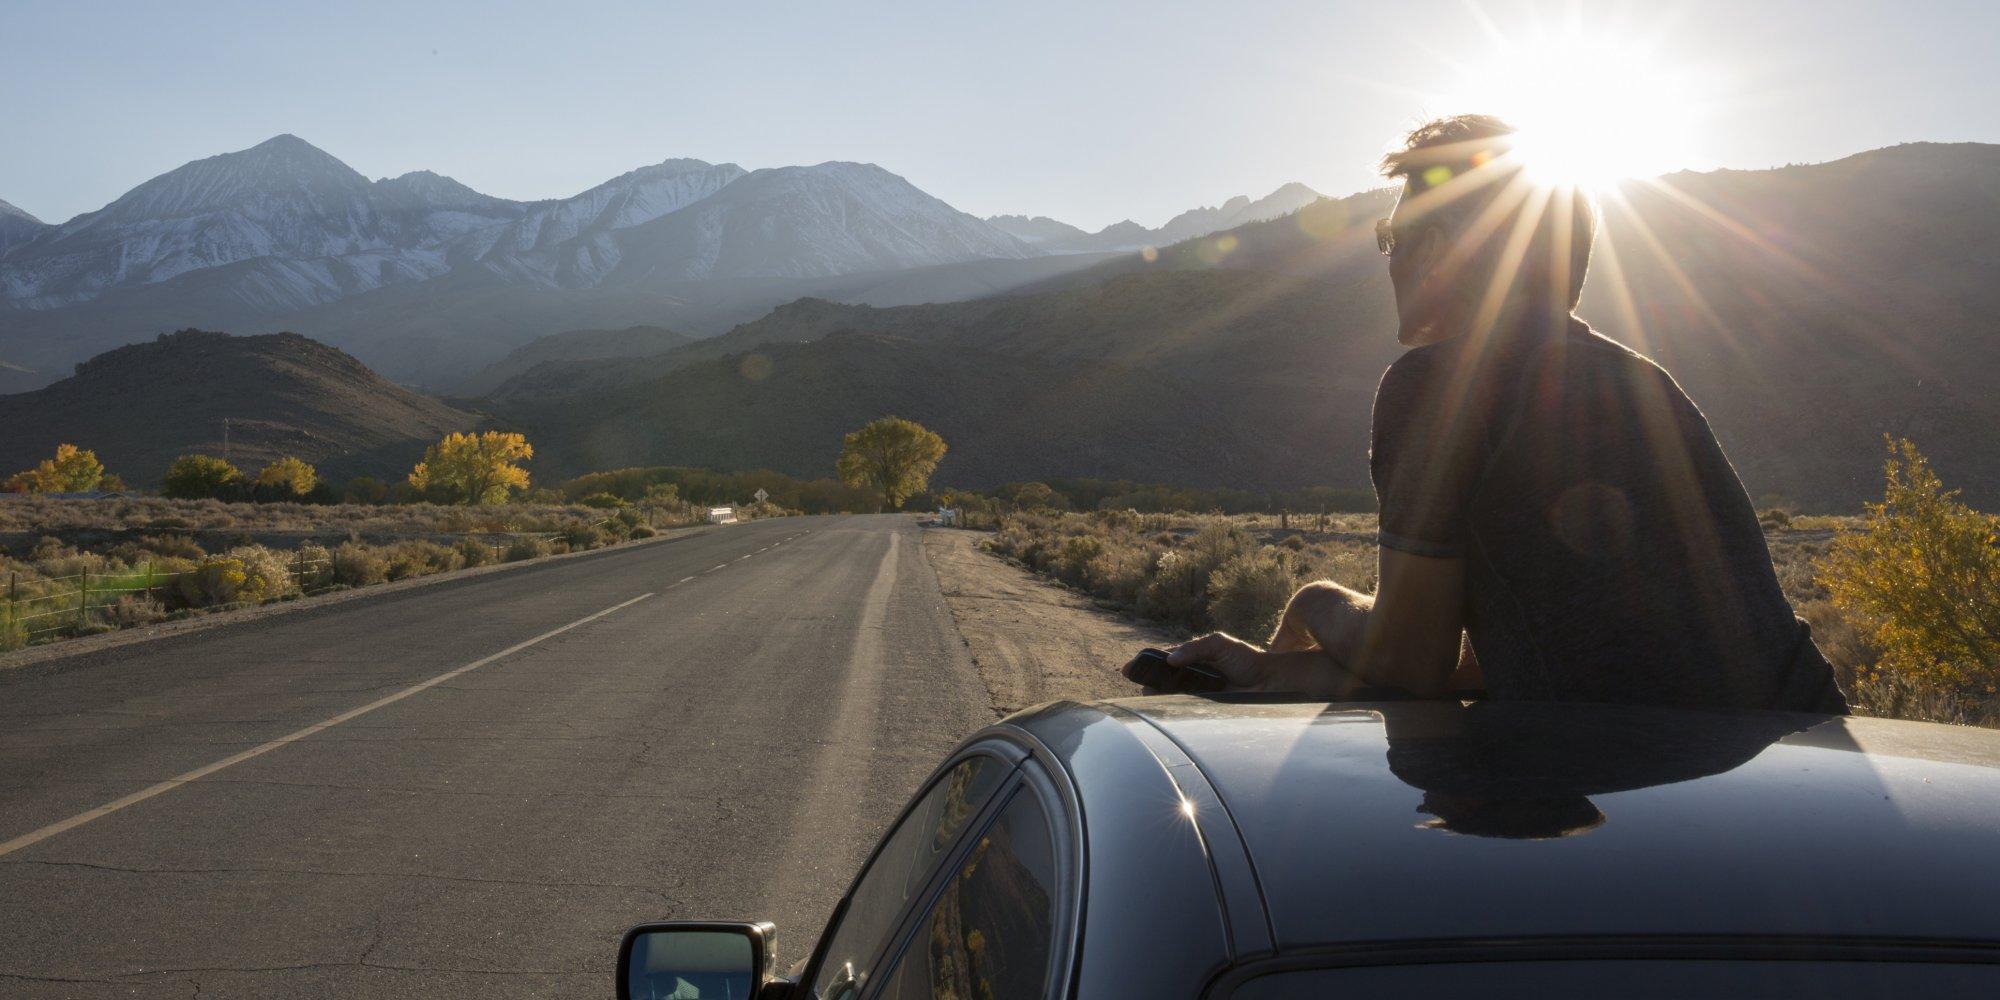 635929093250612965-1298782767_o-ROAD-TRIP-CALIFORNIA-facebook